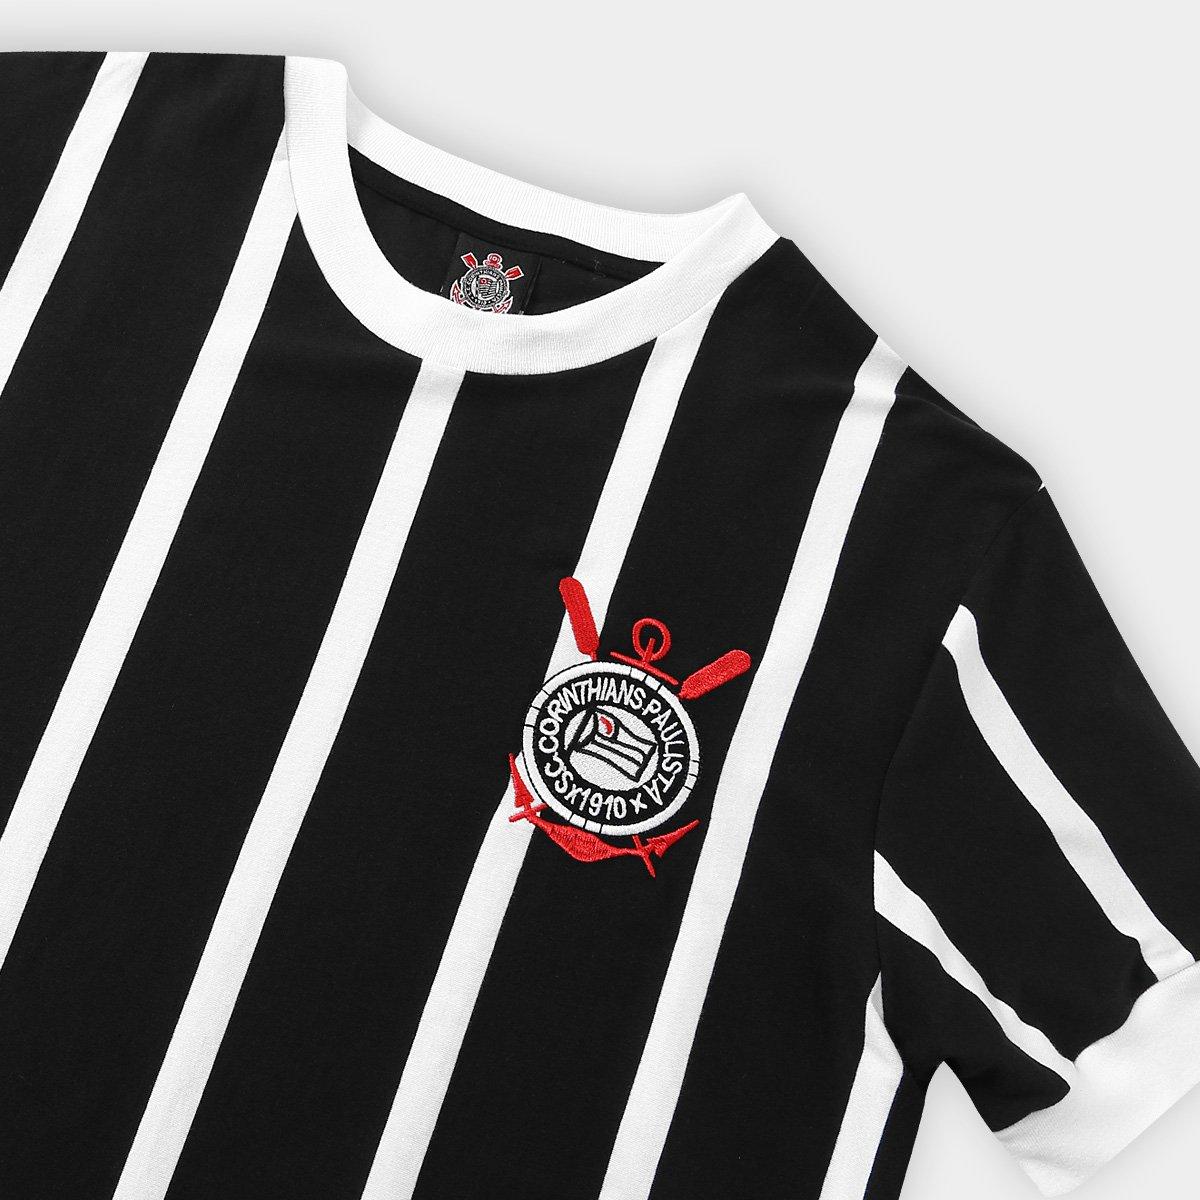 Camisa Retrô Corinthians Réplica 1977 Masculina - Compre Agora ... c03a09efd6763